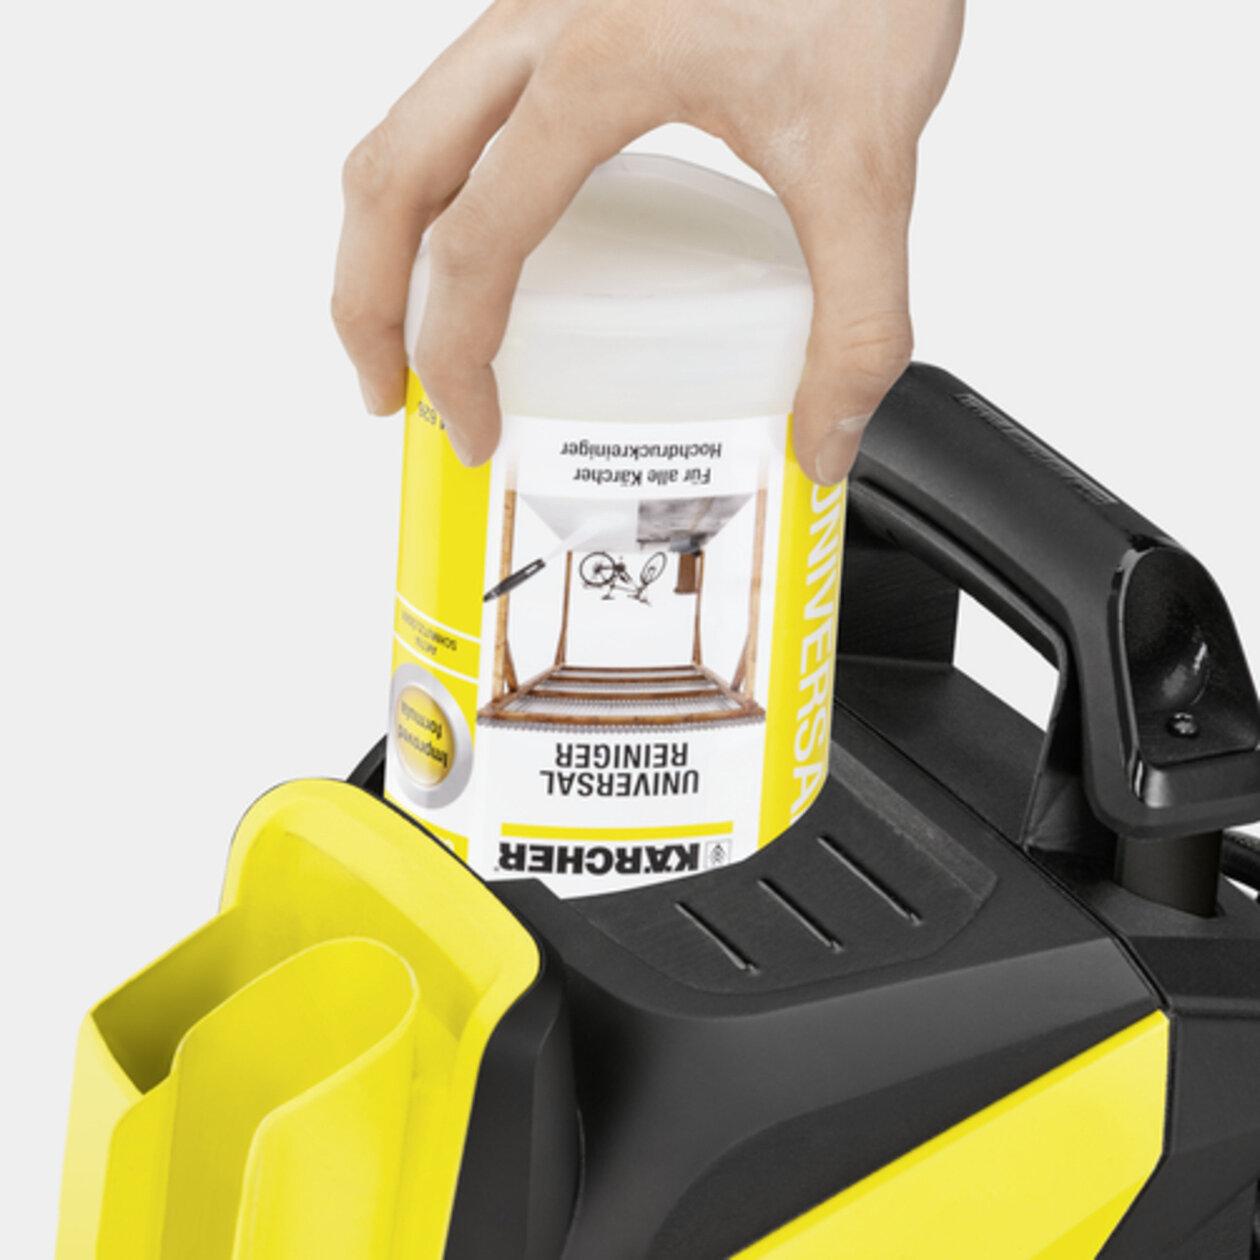 Nettoyeur haute pression K 4 Full Control: Plug 'n' Clean